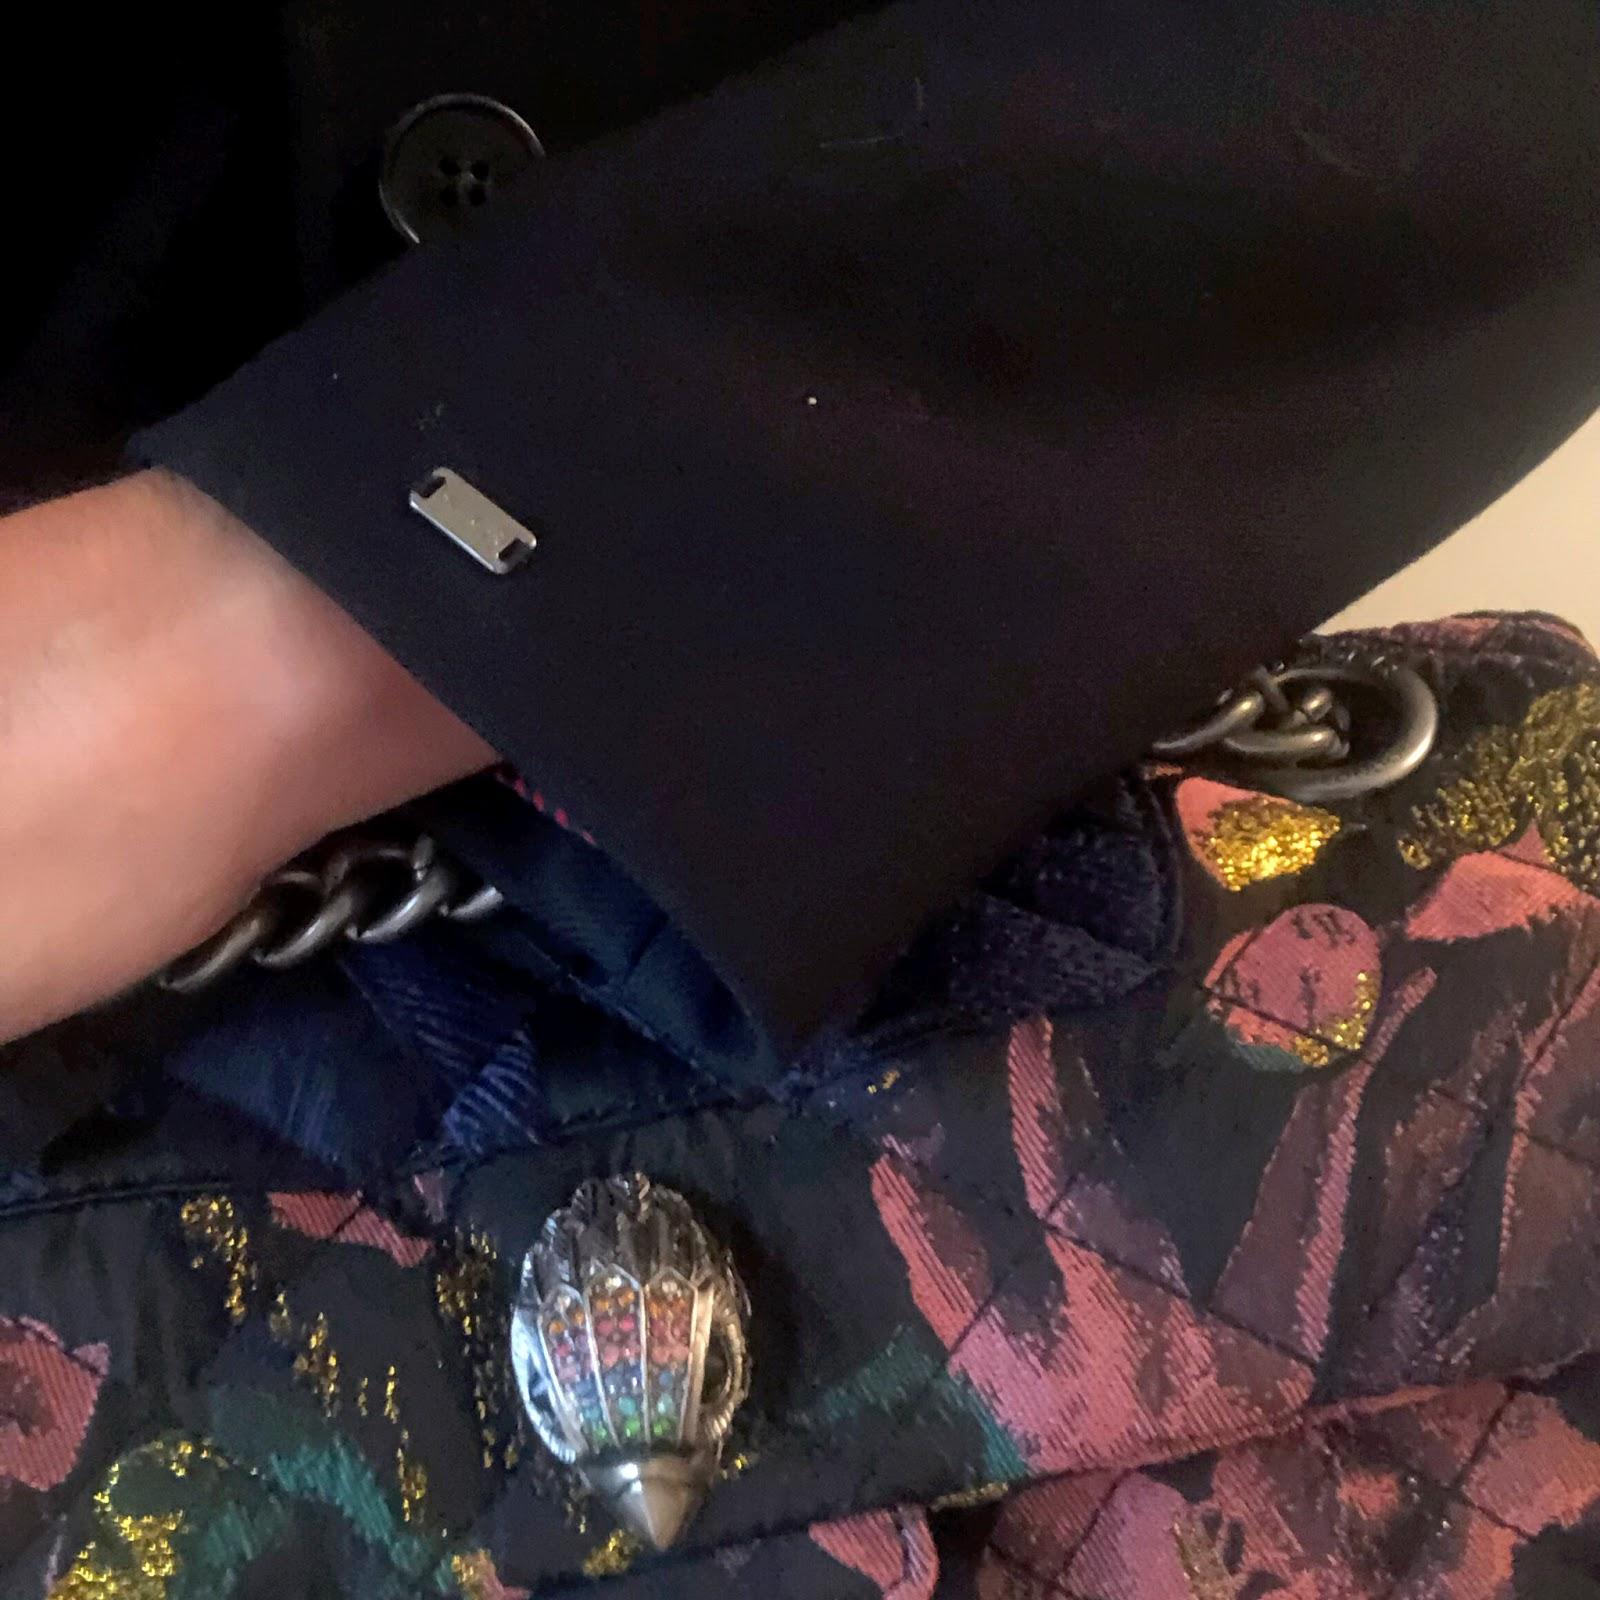 my midlife fashion, hobbs felt fedora hat, marks and spencer pure cashmere roll neck jumper, kurt geiger kensington fabric bag, tommy hilfiger celeste classic coat, j crew boyfriend jeans, marks and spencer stiletto heel ankle boots